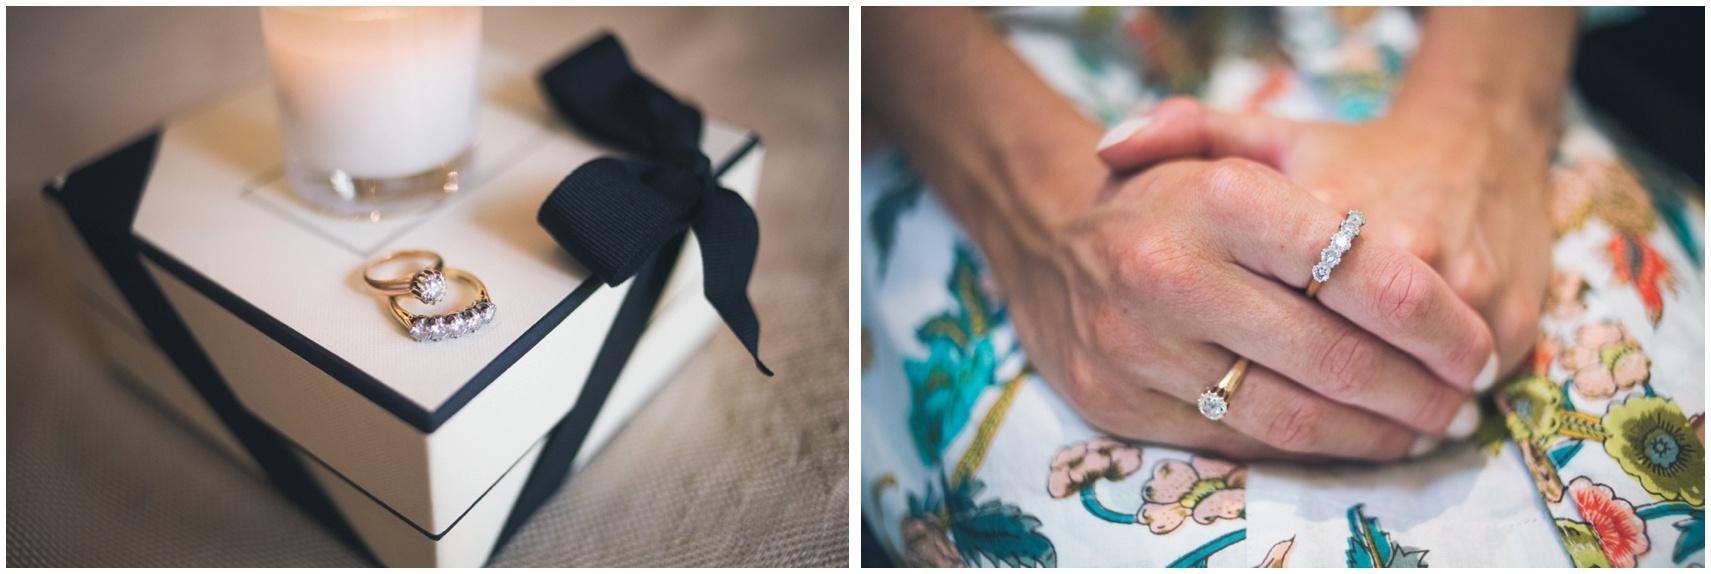 BMC Wedding photography Rutland_0244.jpg